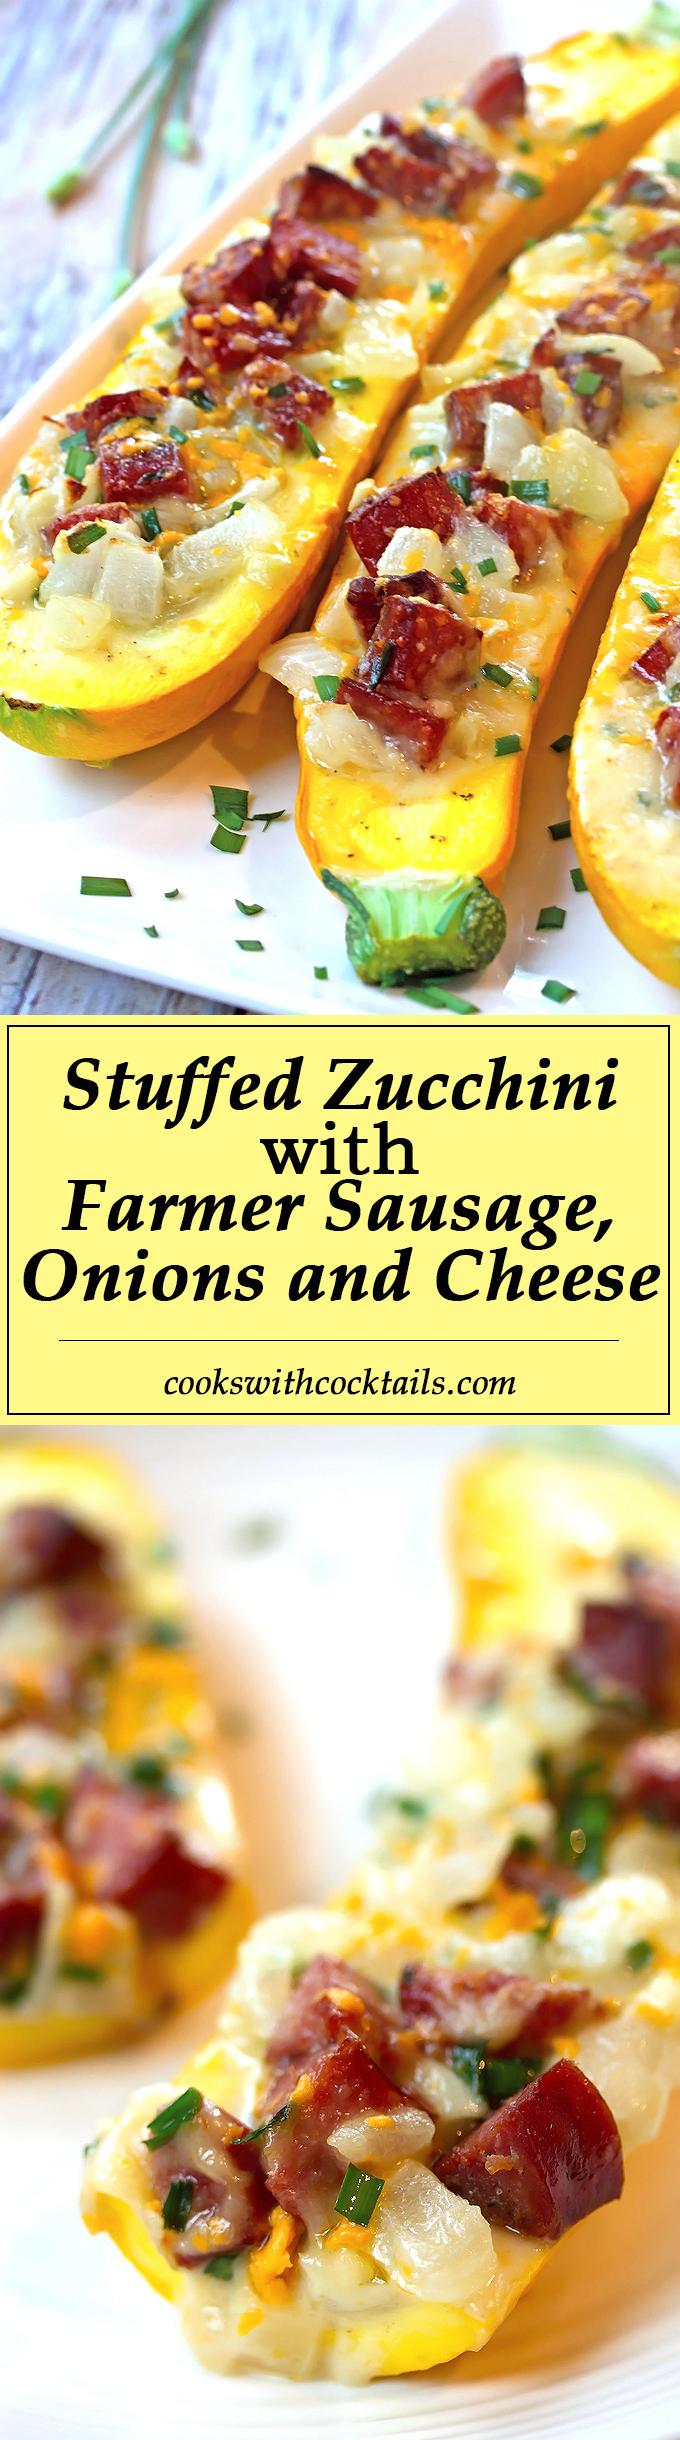 Stuffed Zucchini with Farmer Sausage, Onions & Cheese